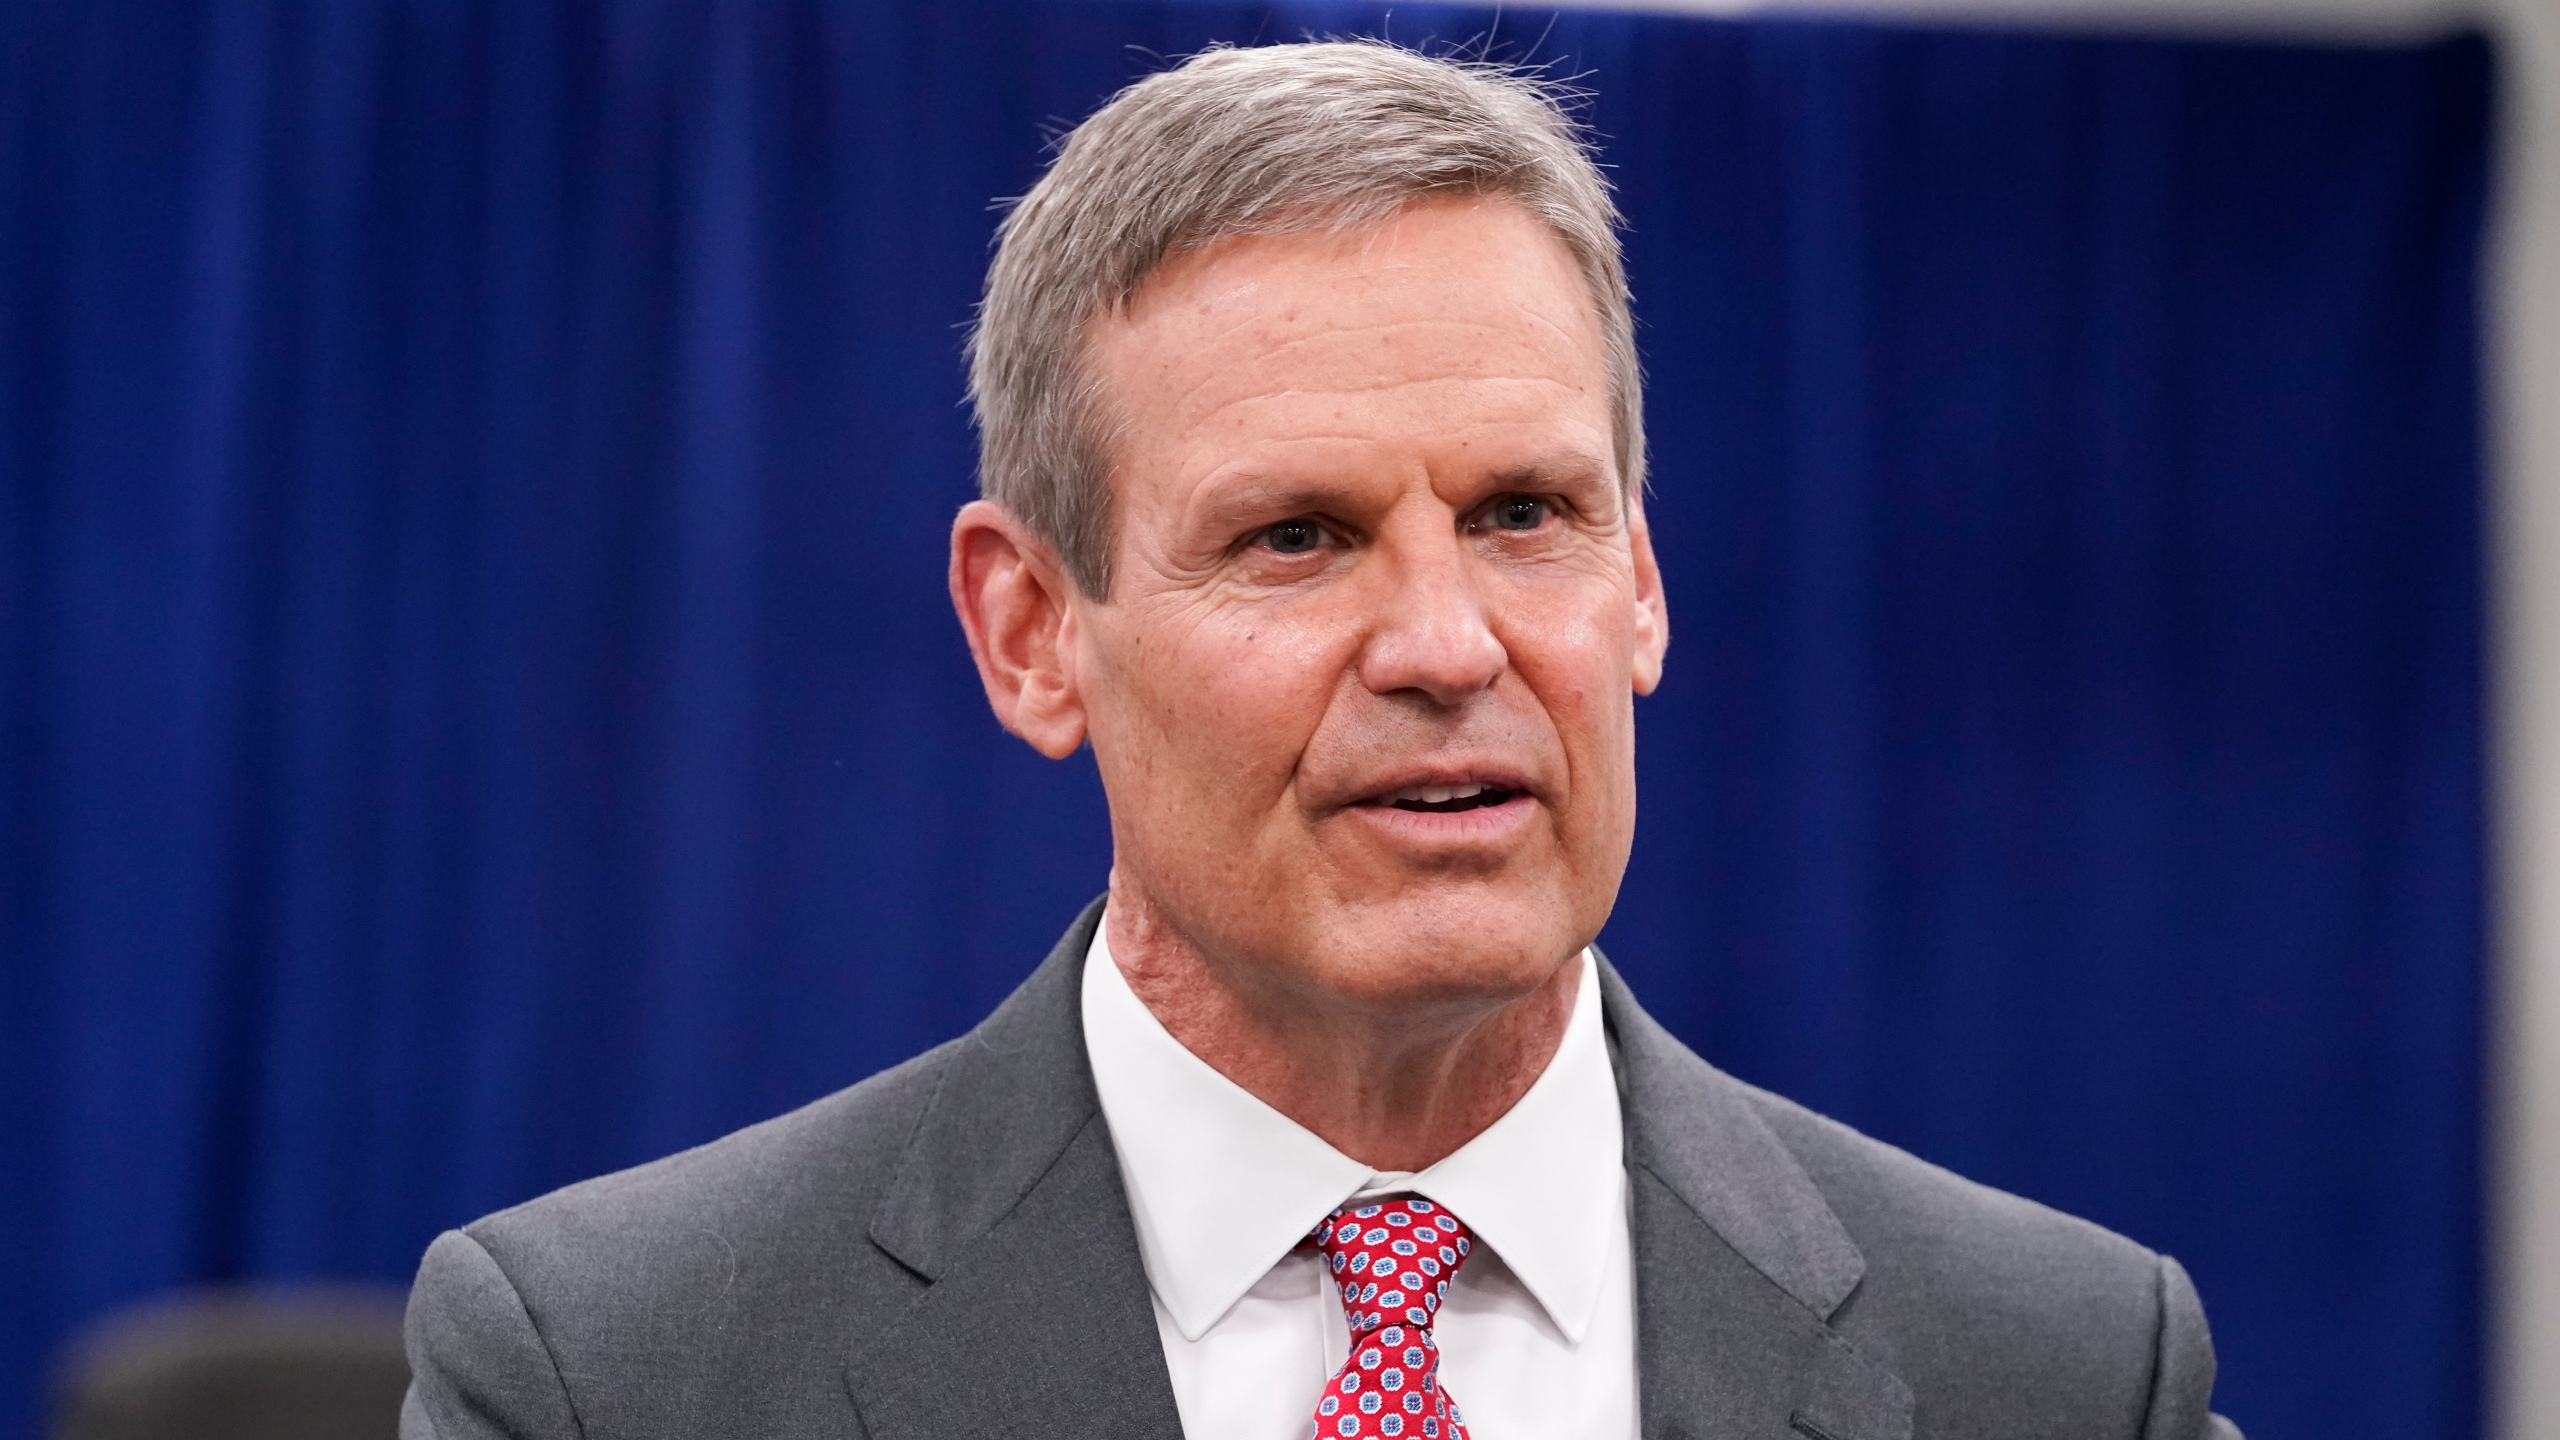 Tennessee Gov. Bill Lee speaks with reporters in Nashville on Nov. 10, 2020. (Mark Humphrey / Associated Press)